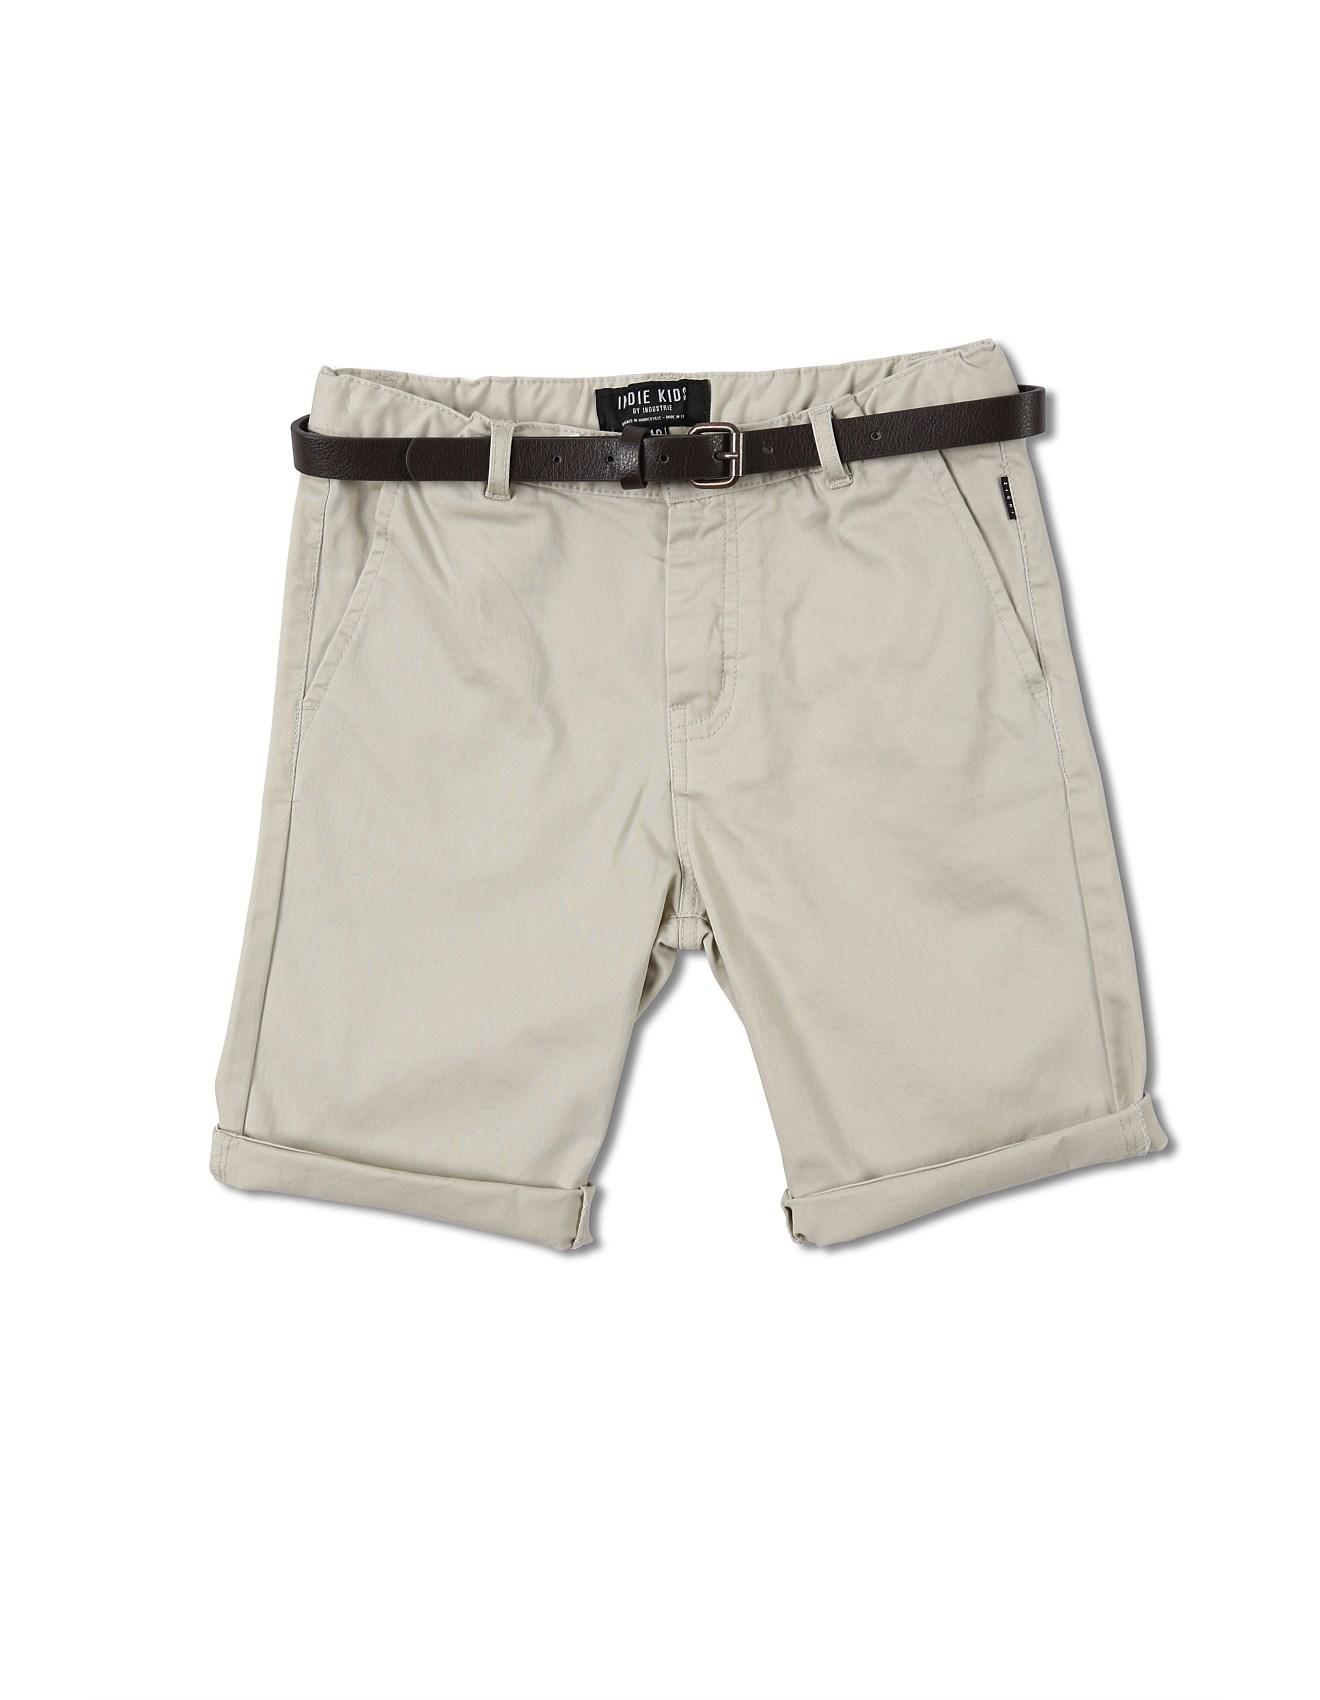 b1f09975e281 Cuba Chino Short (Boys 8-14 Years)